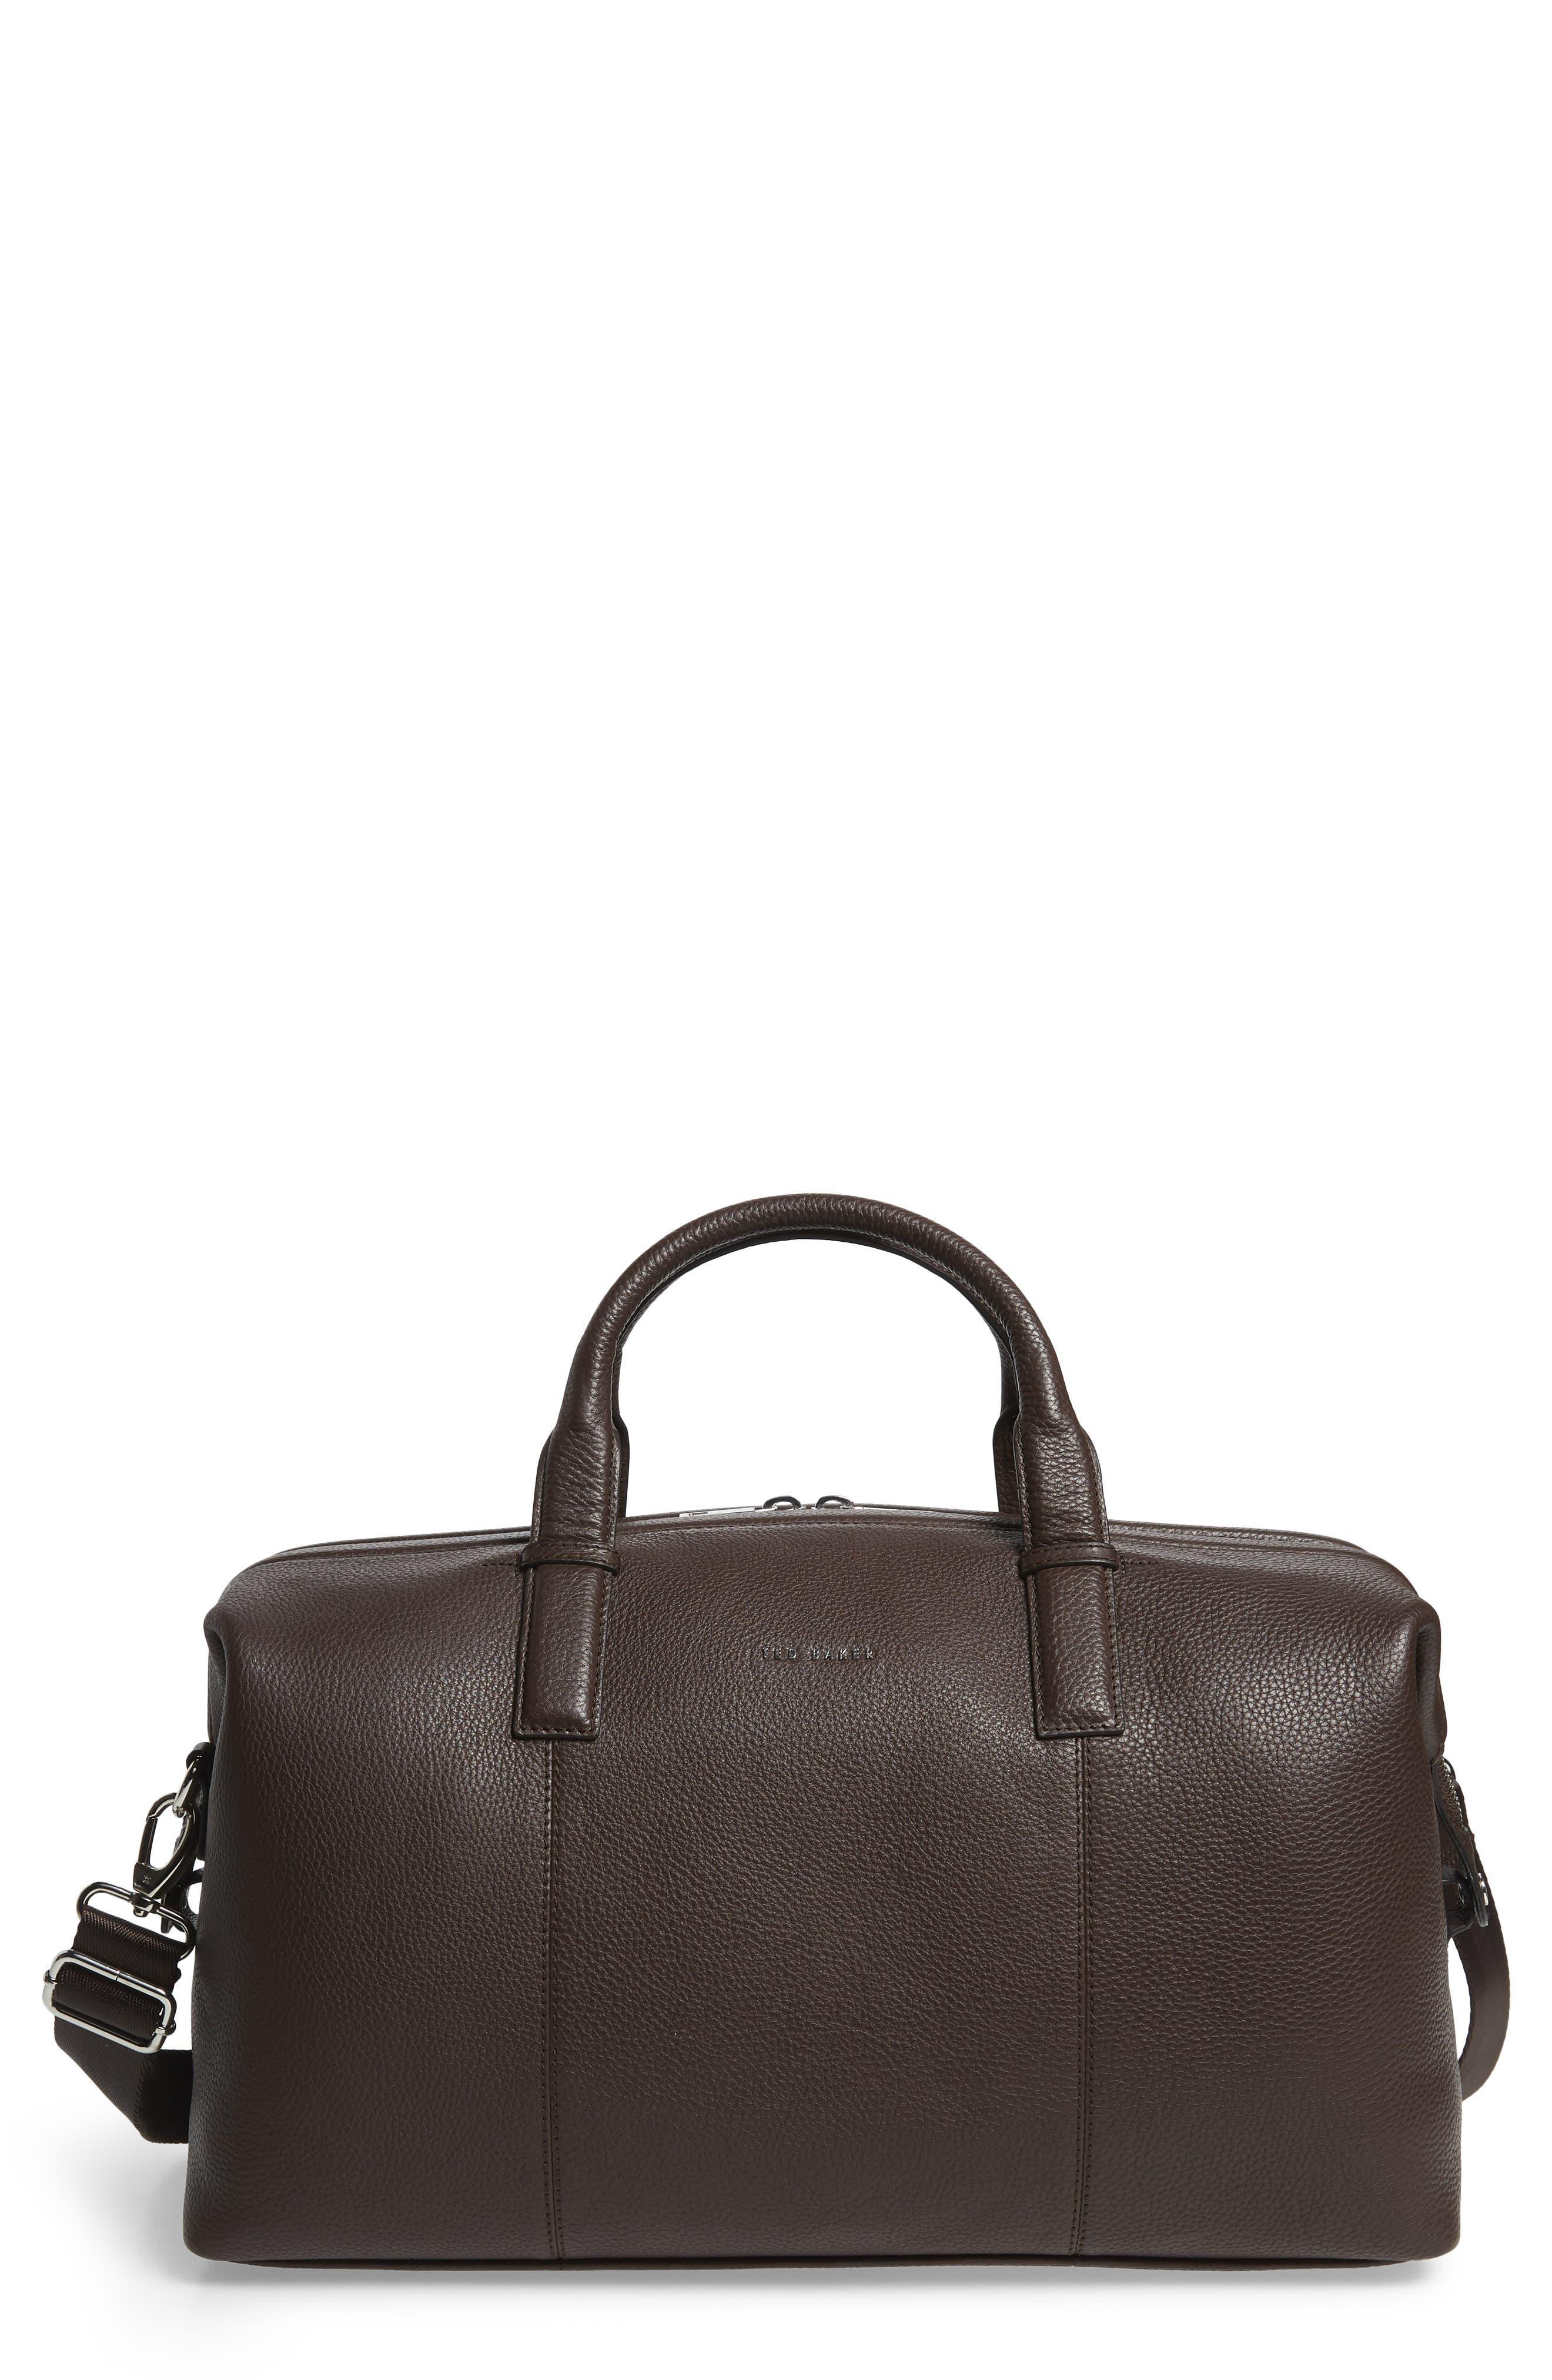 Bagtron Leather Duffle Bag